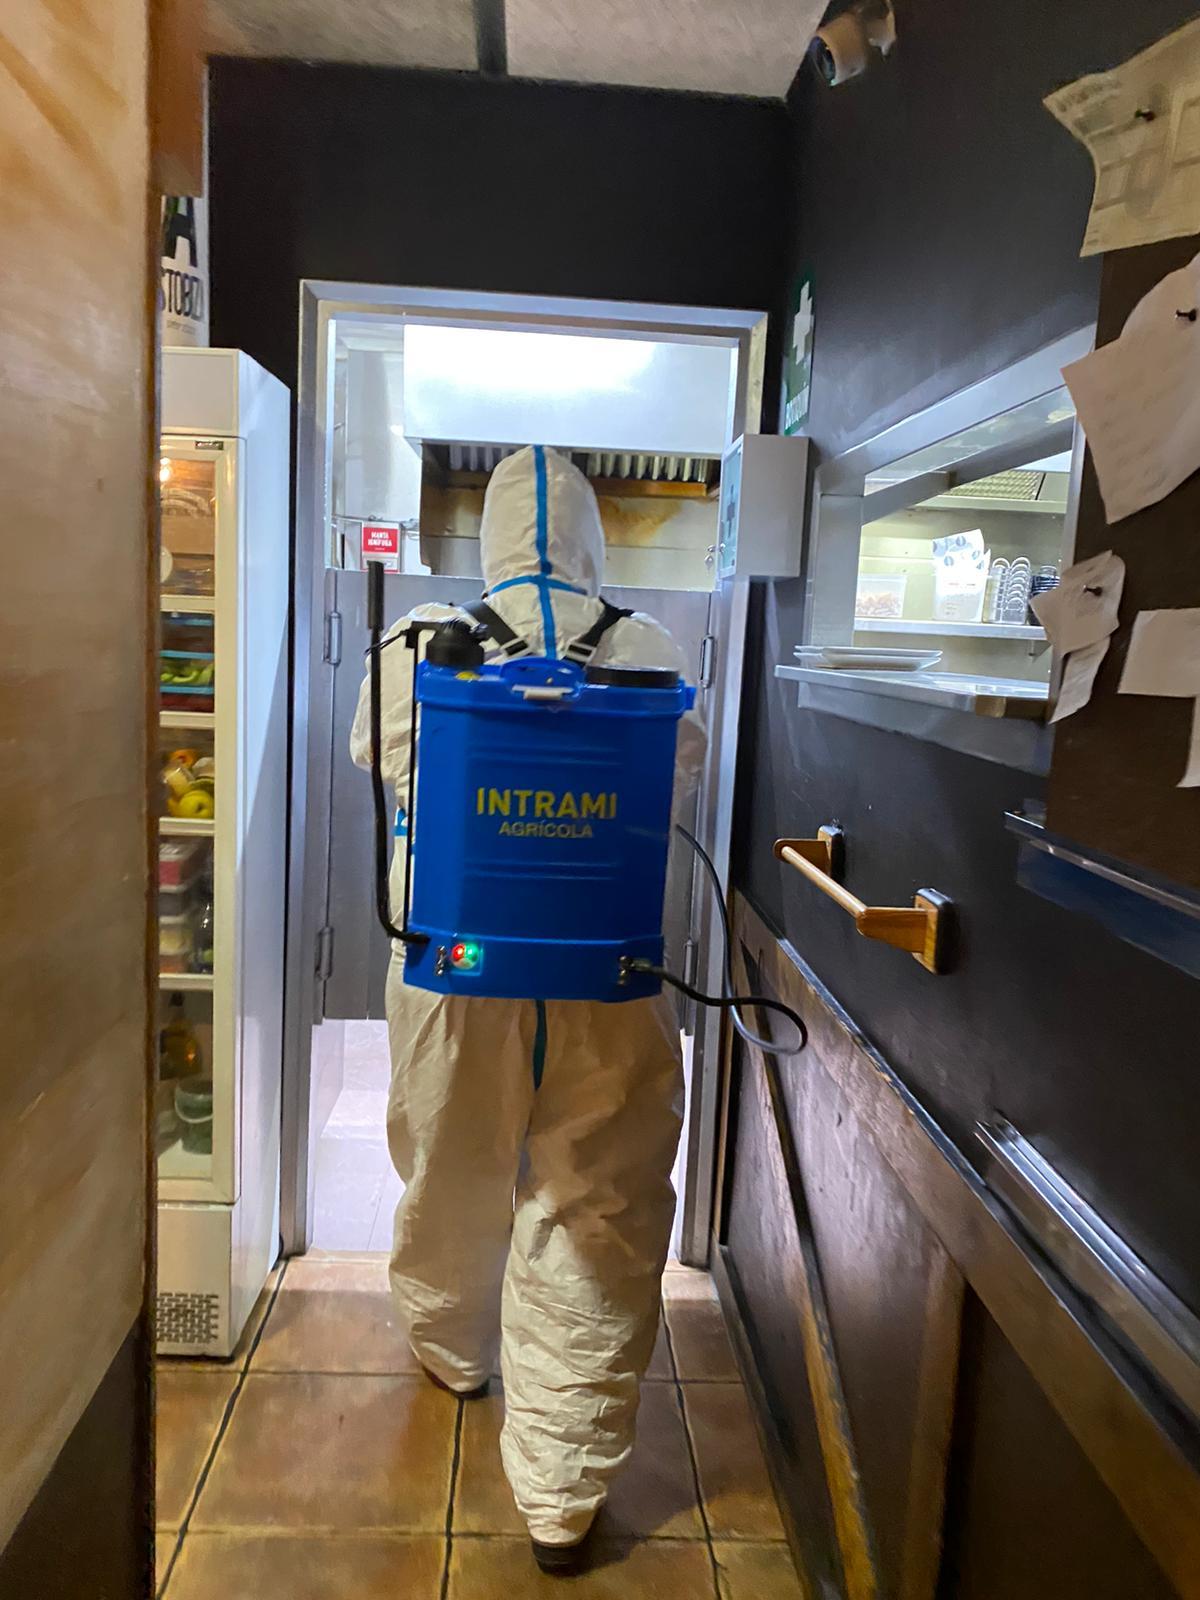 desinfeccion por coronavirus covid 19 en barcelona 2020